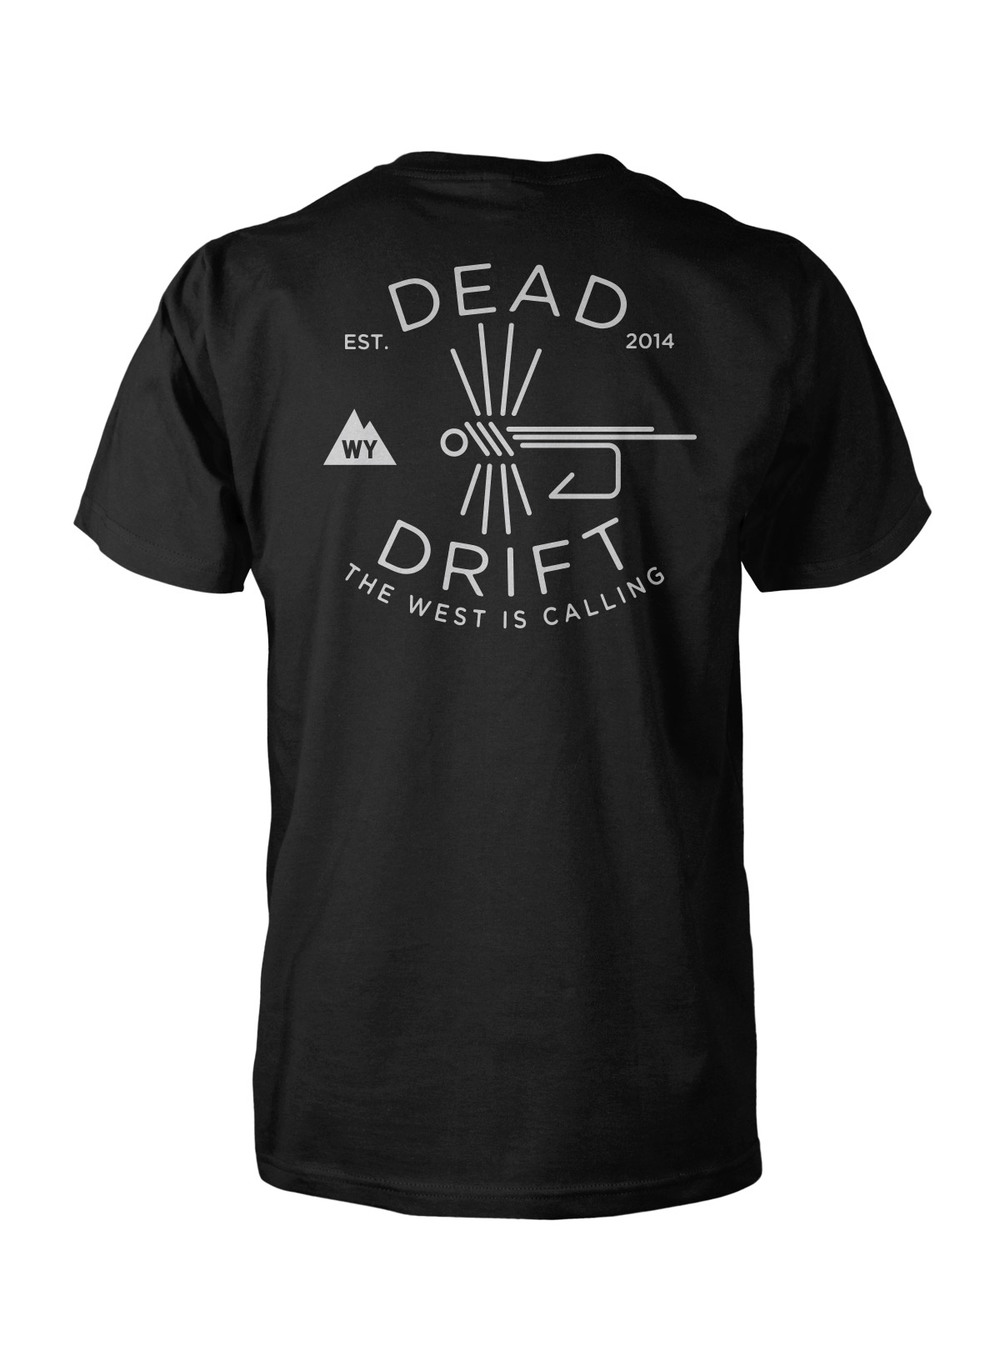 Dead drift fly fish hook tee dead drift for Two fish apparel